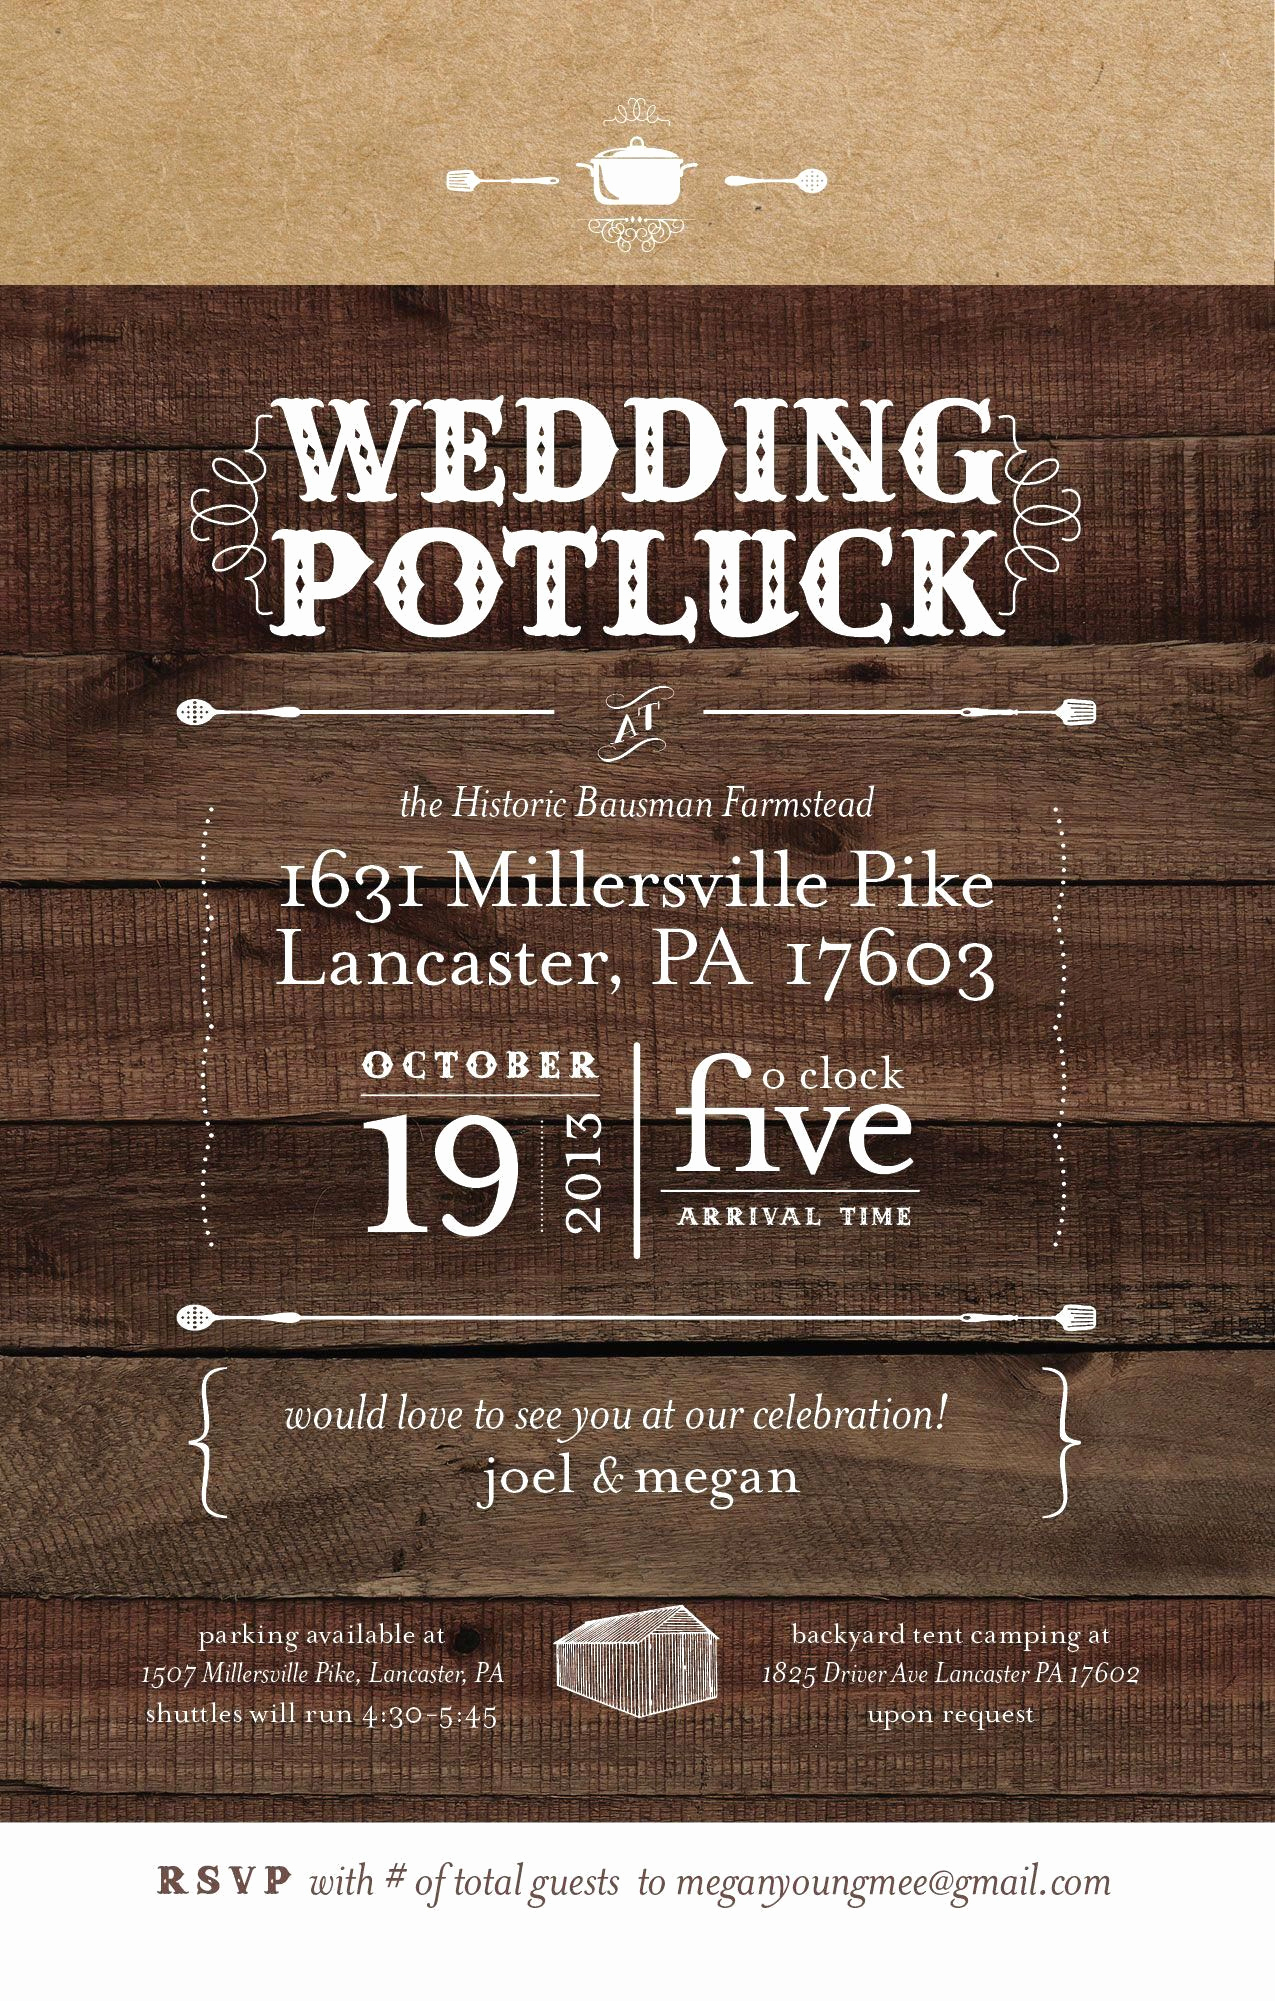 Potluck Wedding Invitation Wording Unique Potluck Wedding Yes Love This Invitation Idea and Style